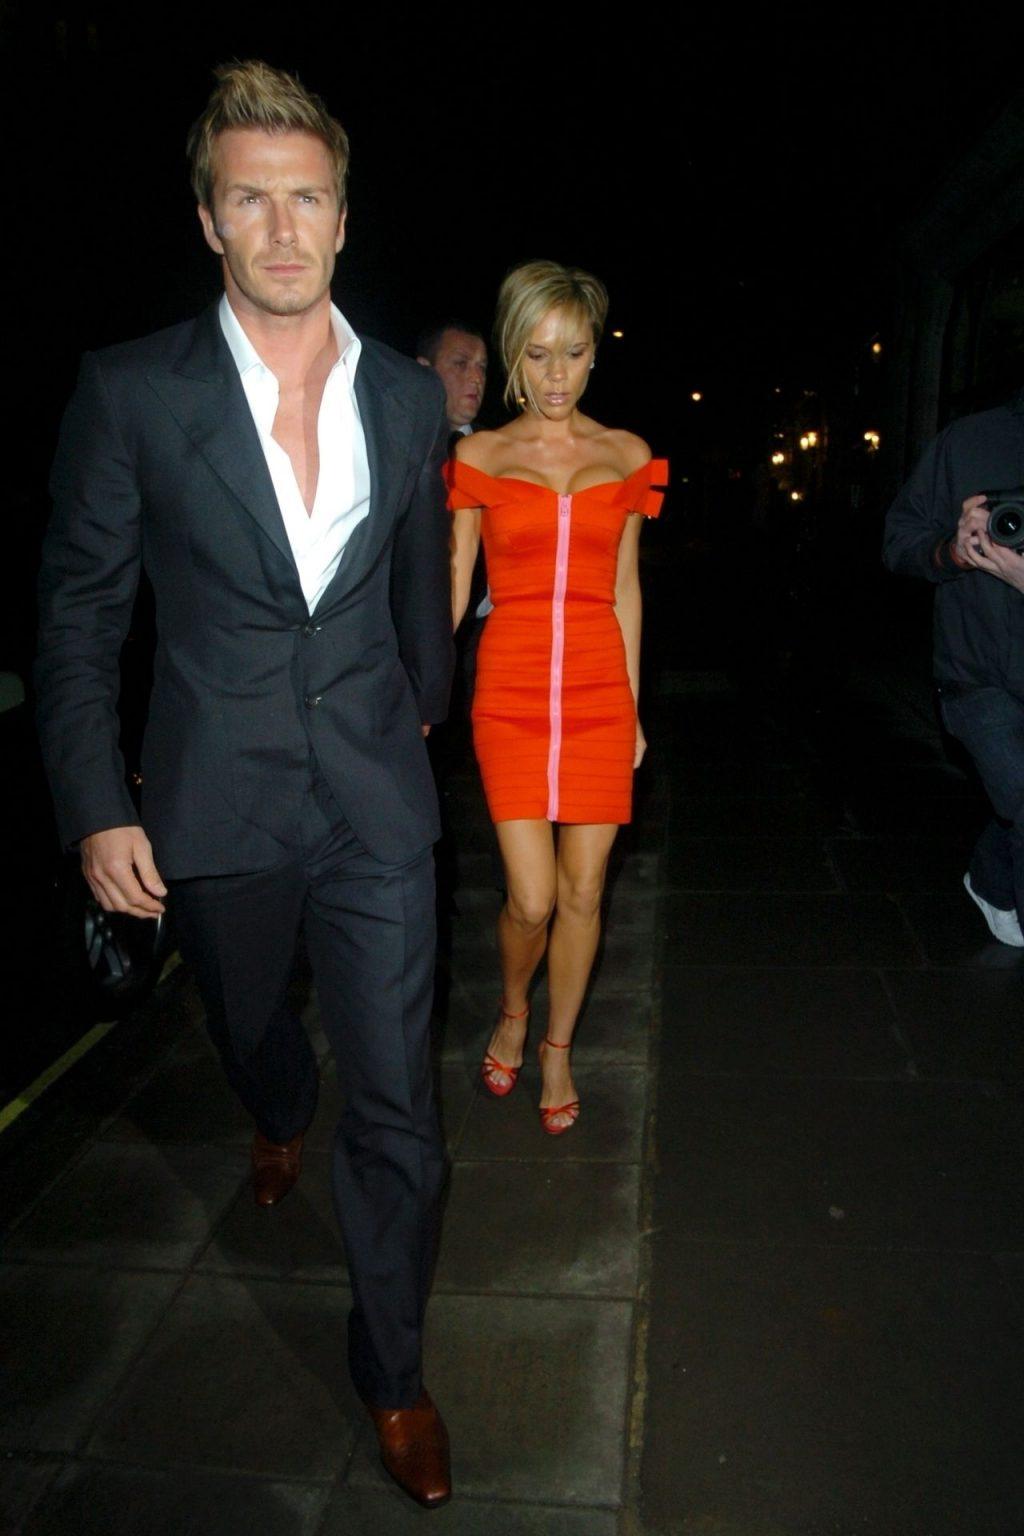 Leggy Victoria Beckham Stuns in a Beautiful Dress in London (17 Photos)